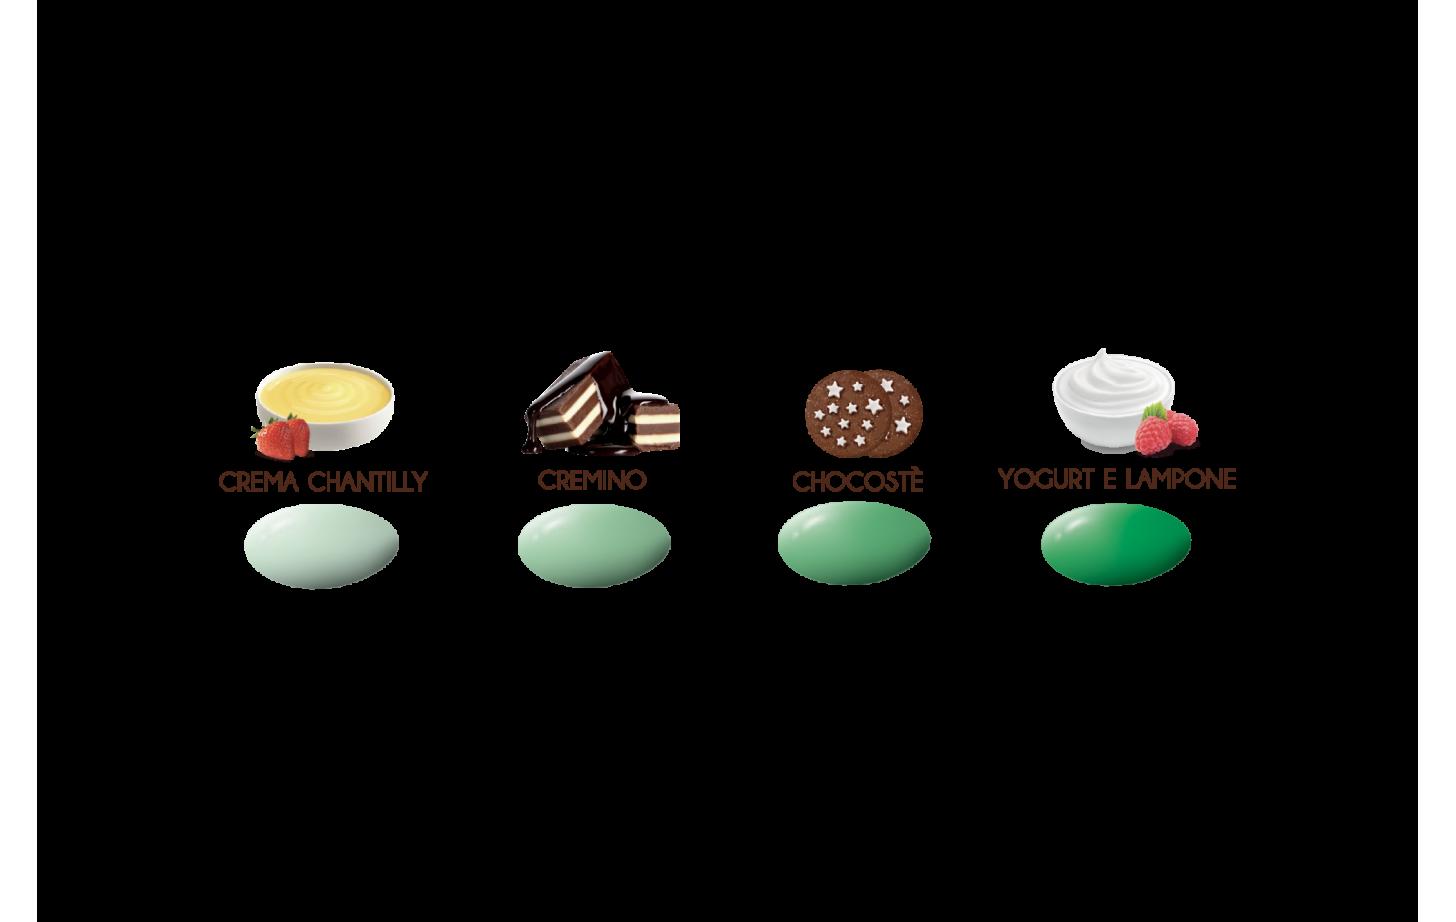 Maxtris Pancake e Sciroppo d'Acero